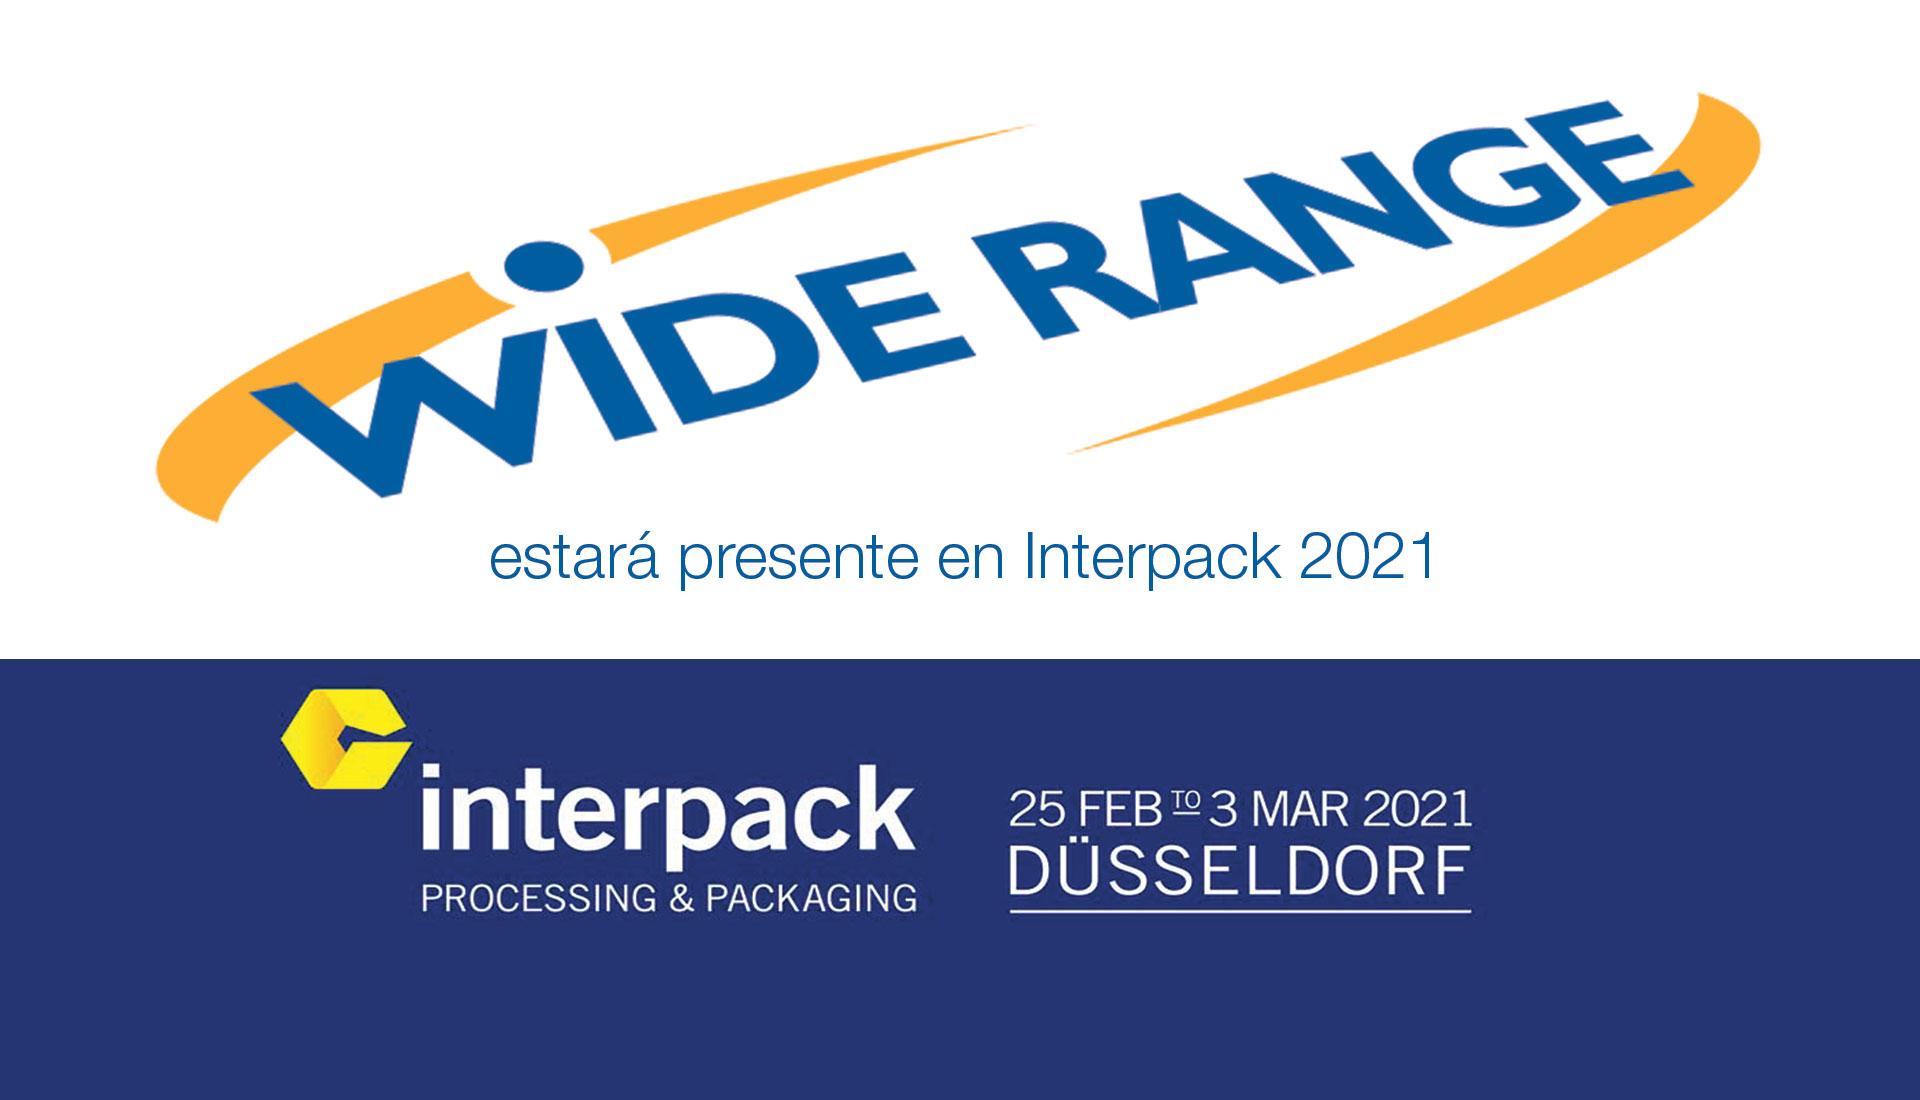 Wide Range sarà presente ad Interpack 2021